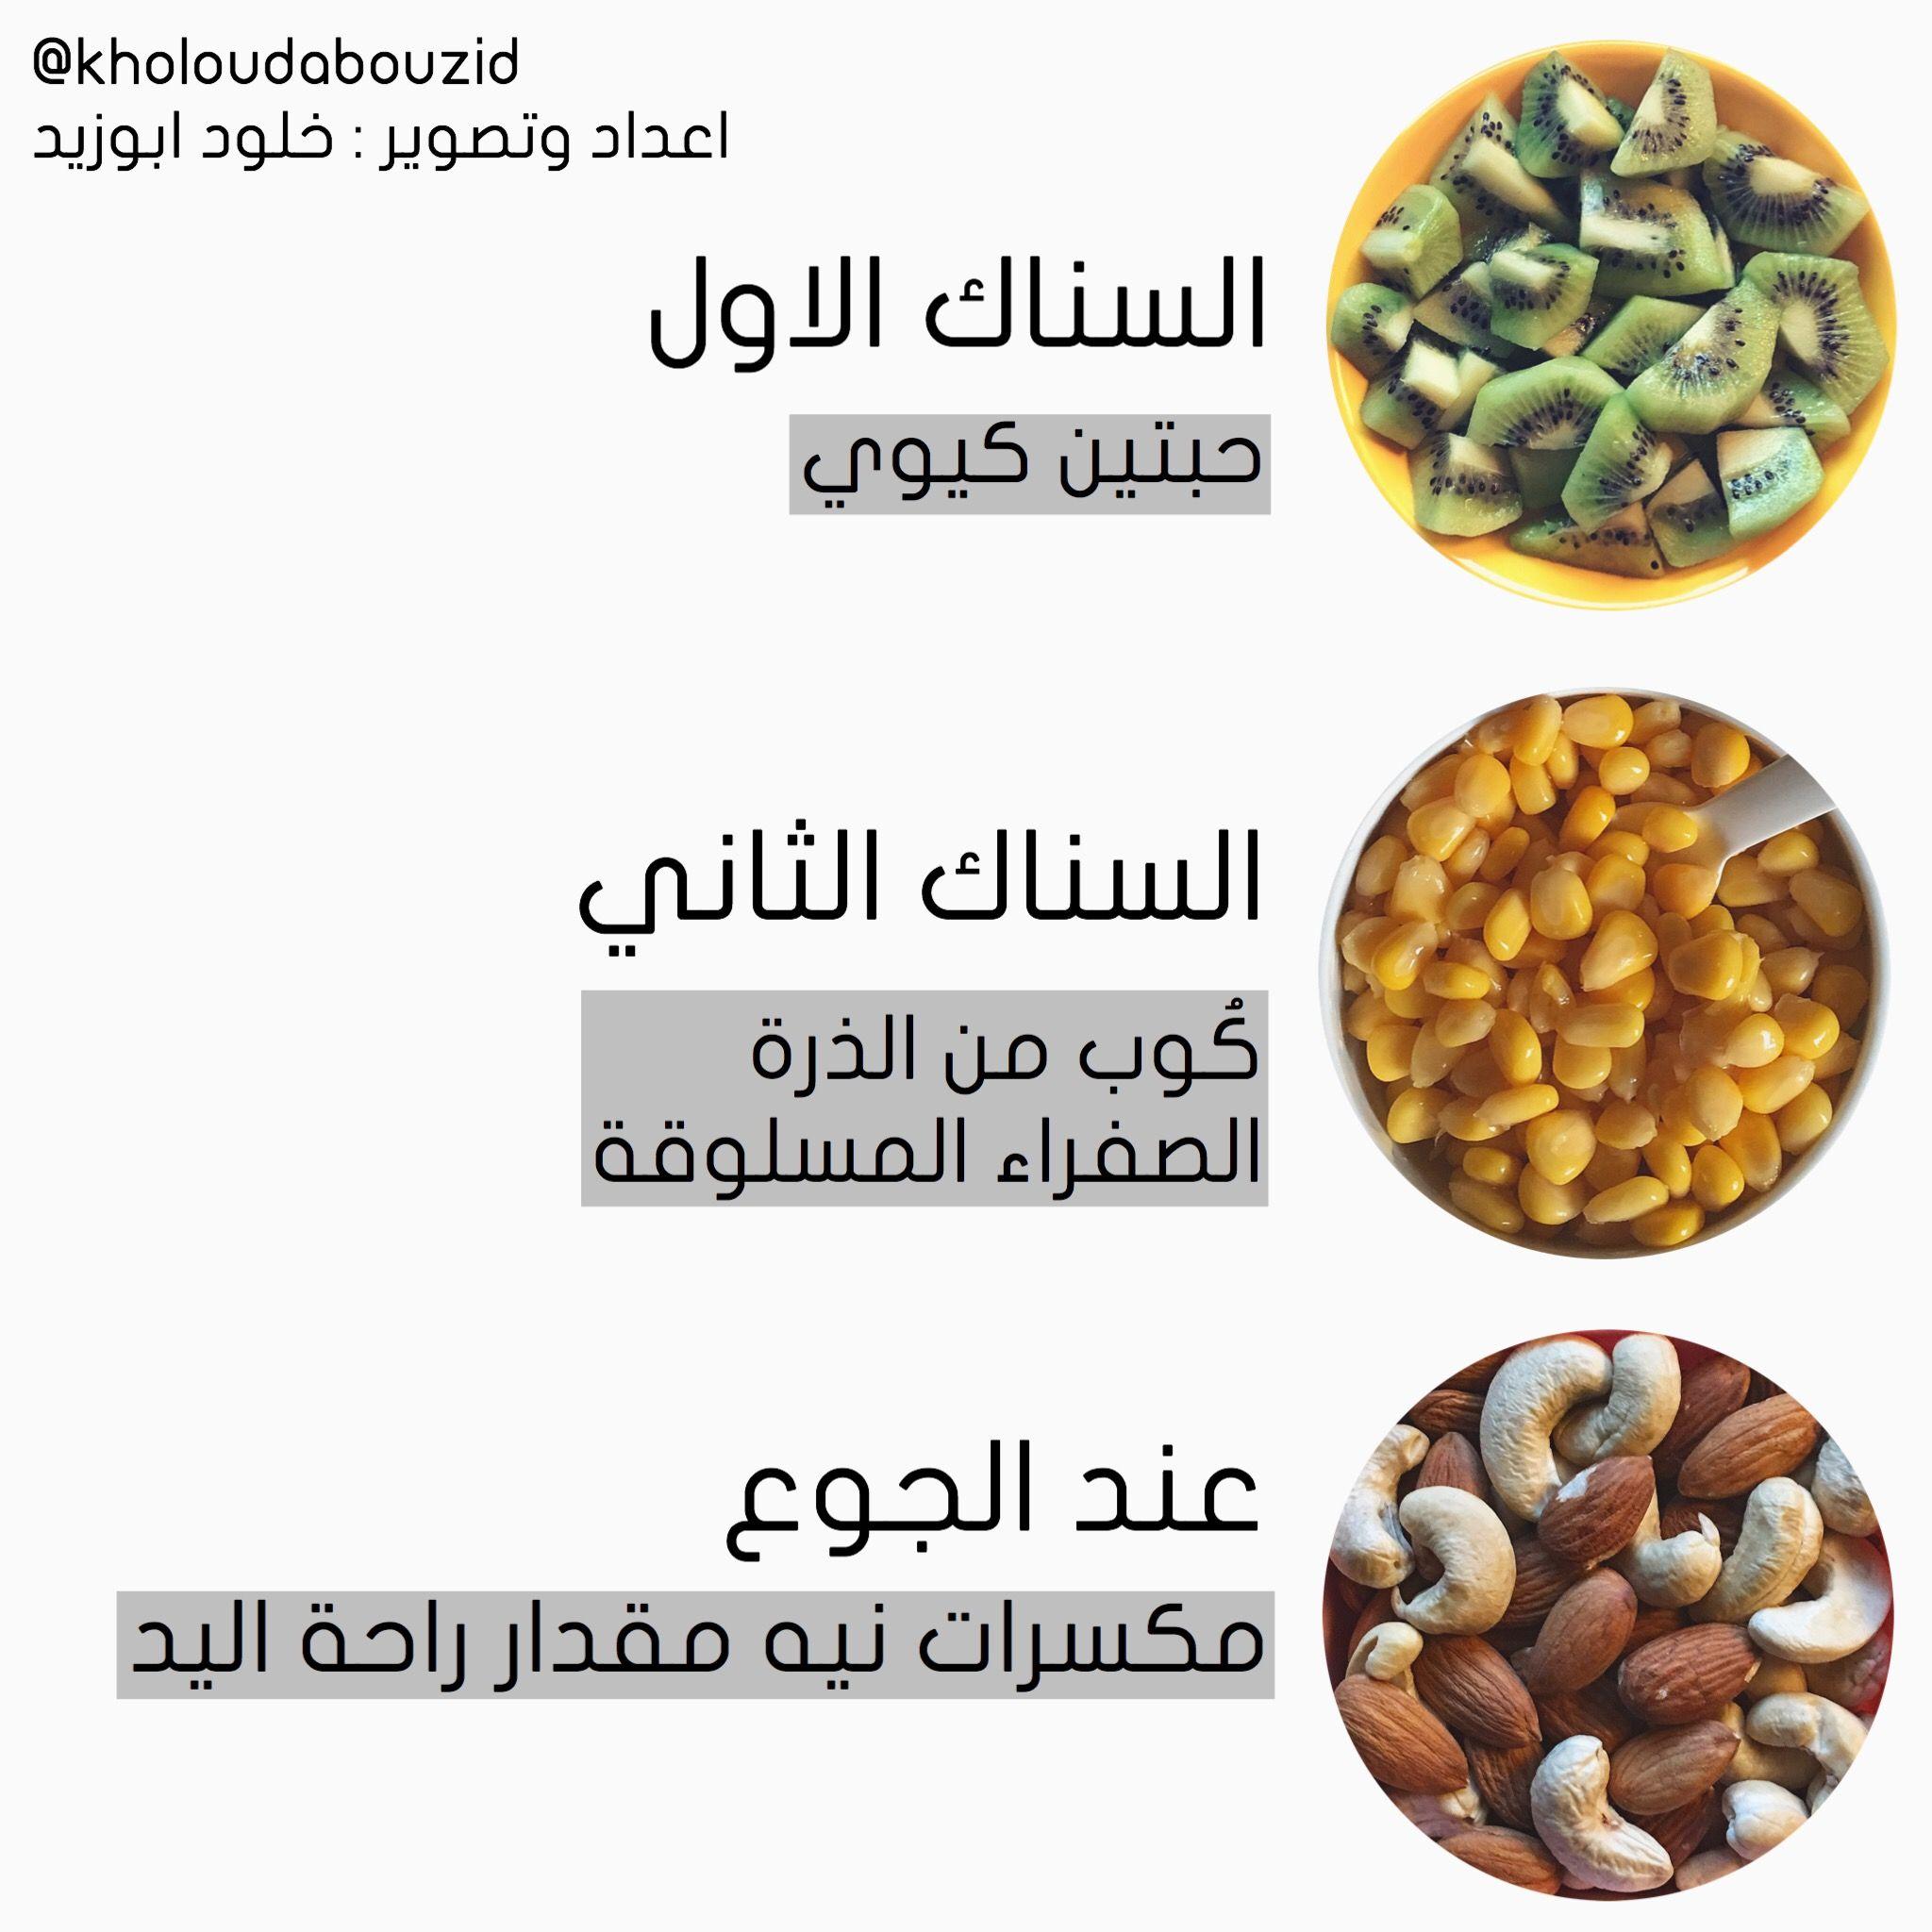 نظام دايت صحي ١٣٠٠ سعر حراري خلود ابوزيد Health Fitness Food Health Facts Food Healthy Breakfast Recipes